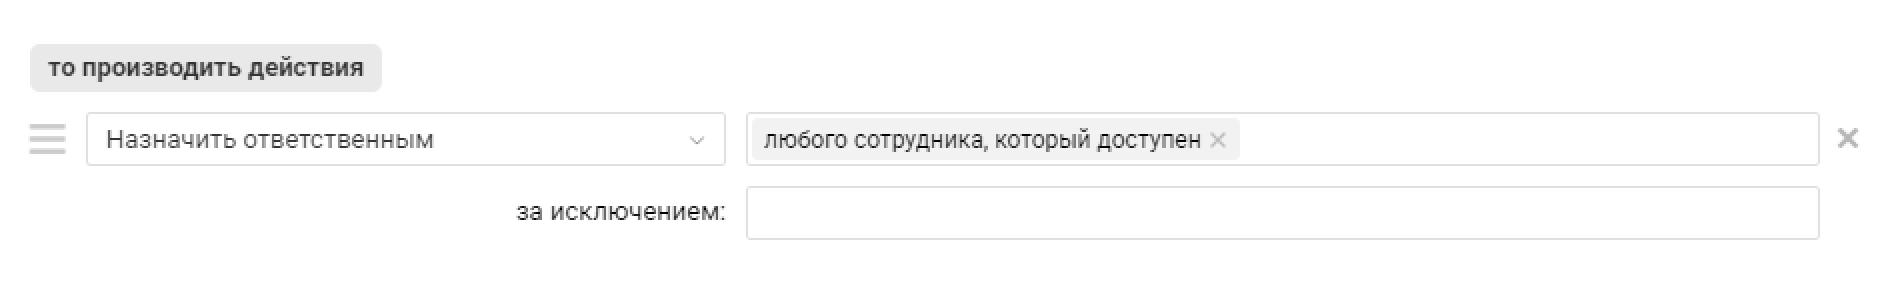 66415b240dfec829693d1b8cb043e38b.png